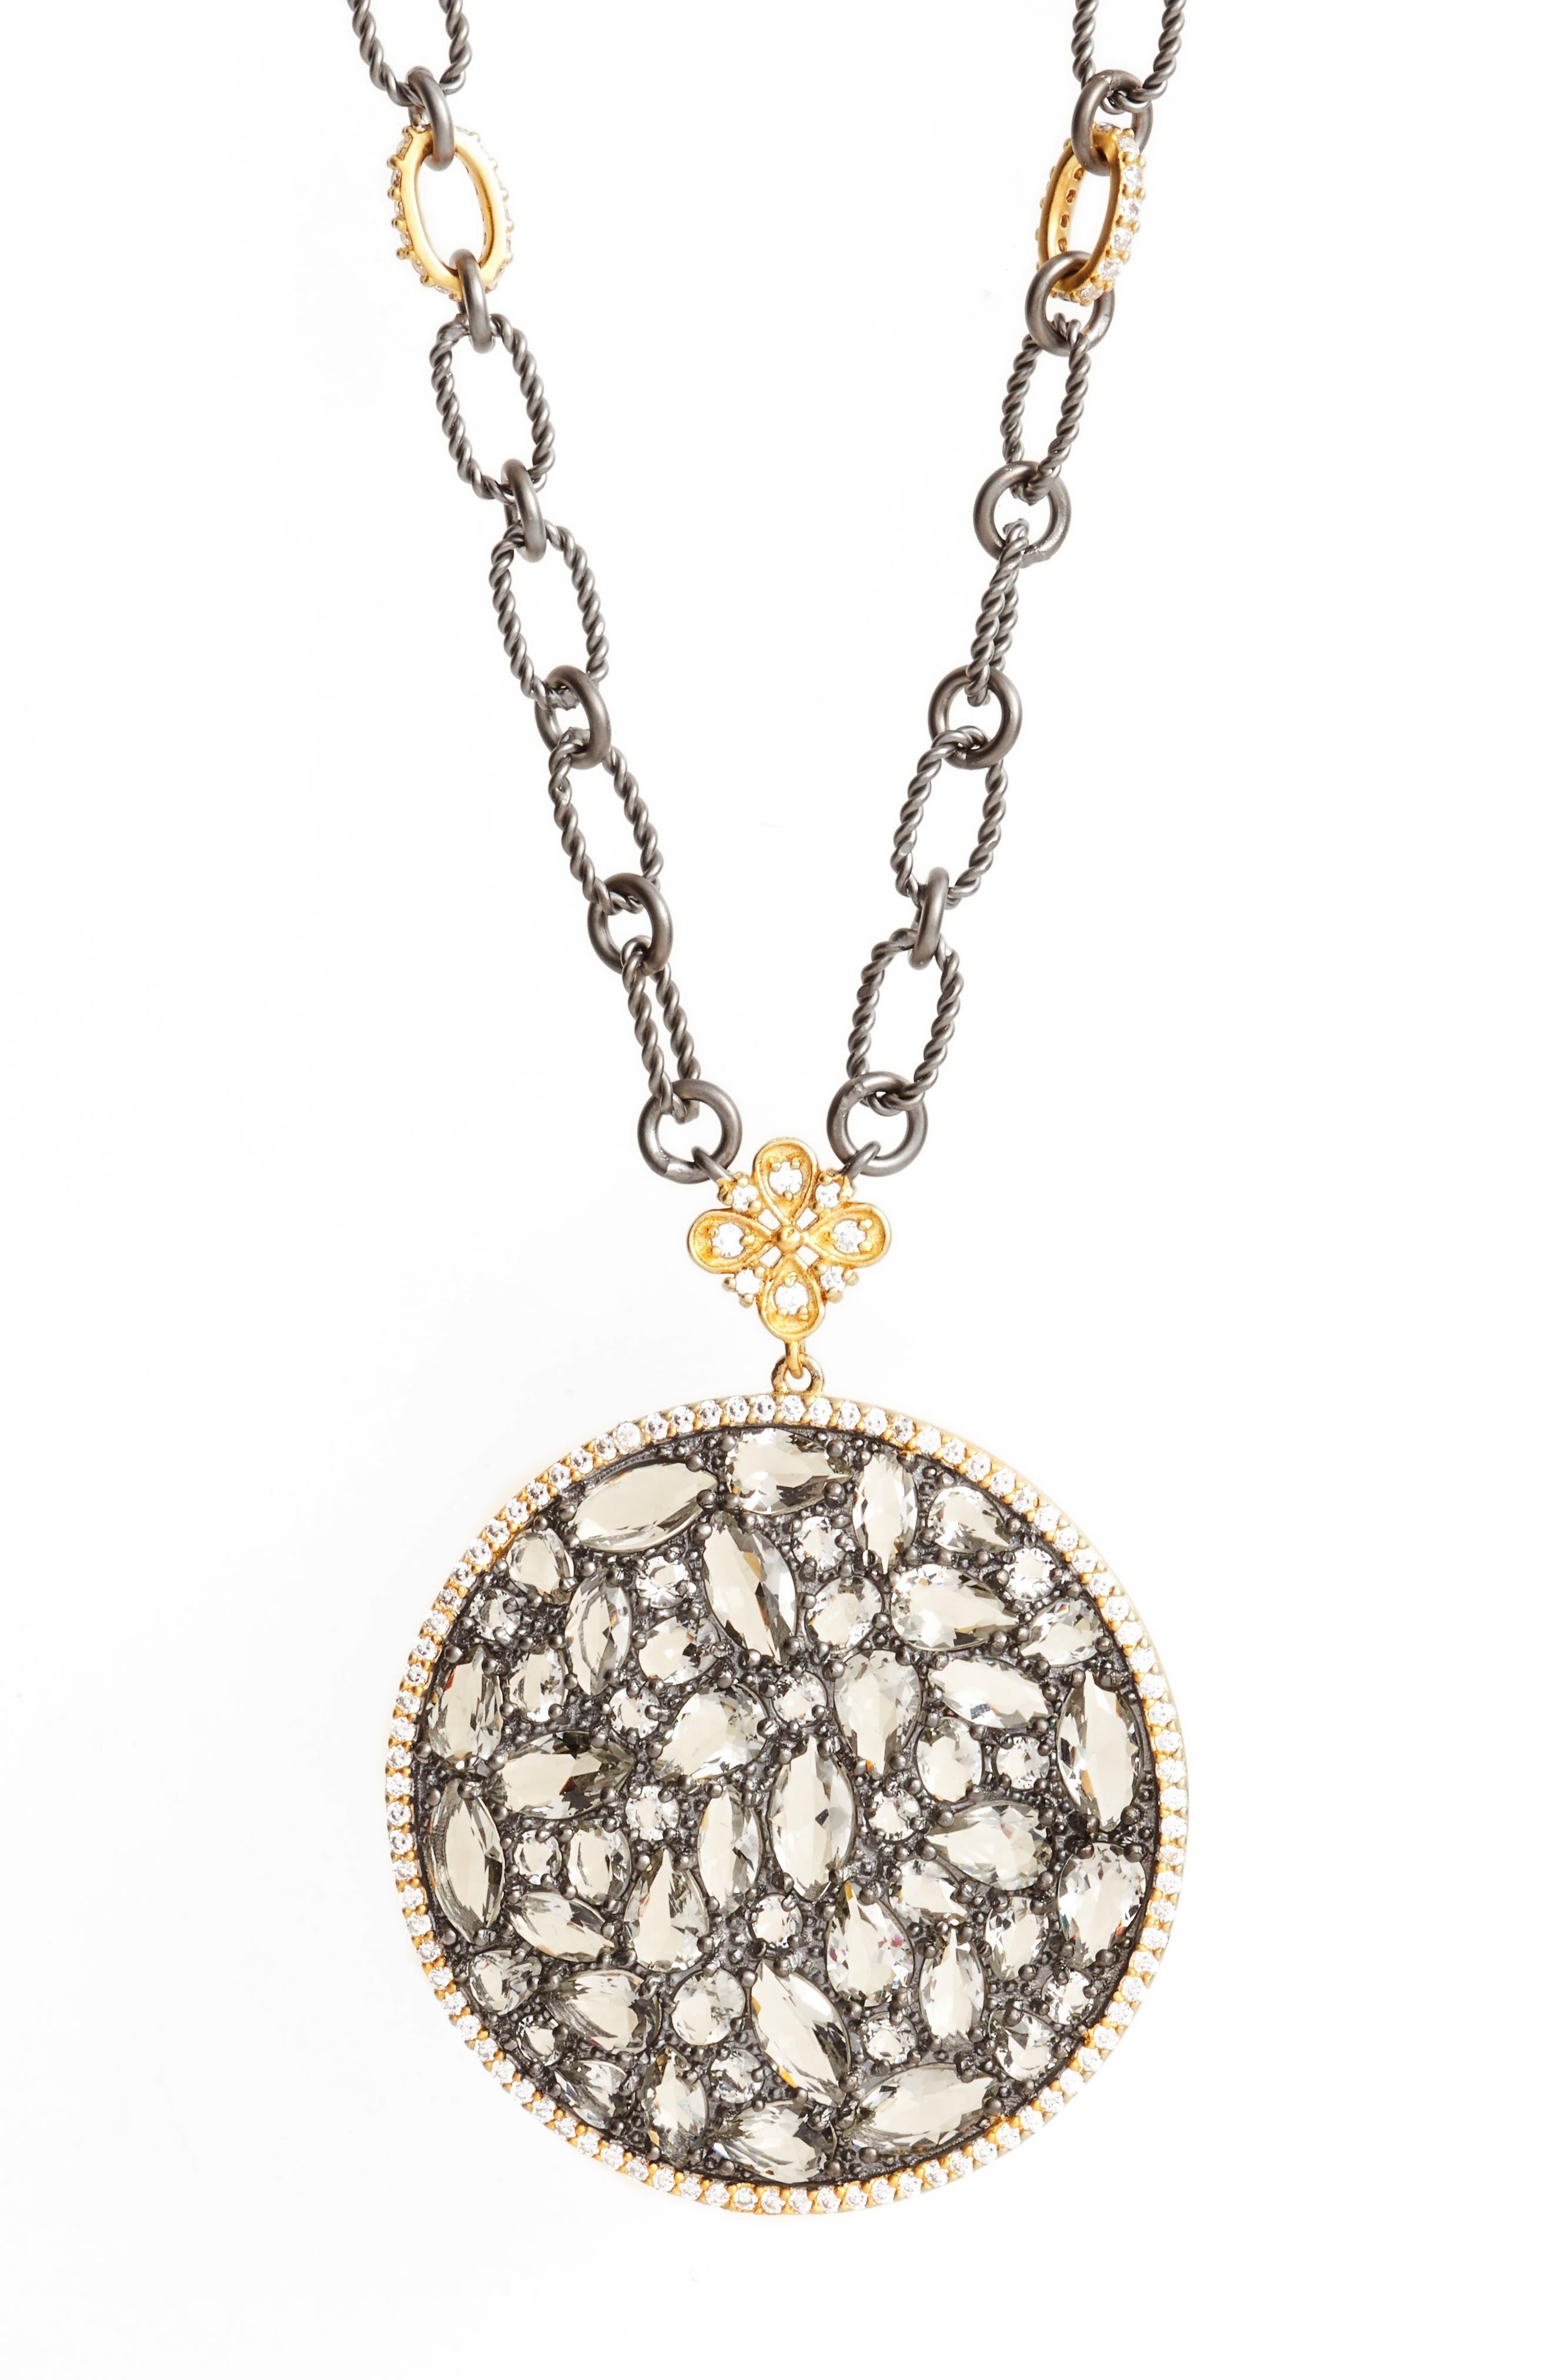 Pebble Pendant Necklace,                             Alternate thumbnail 2, color,                             Gold/ Black Rhodium